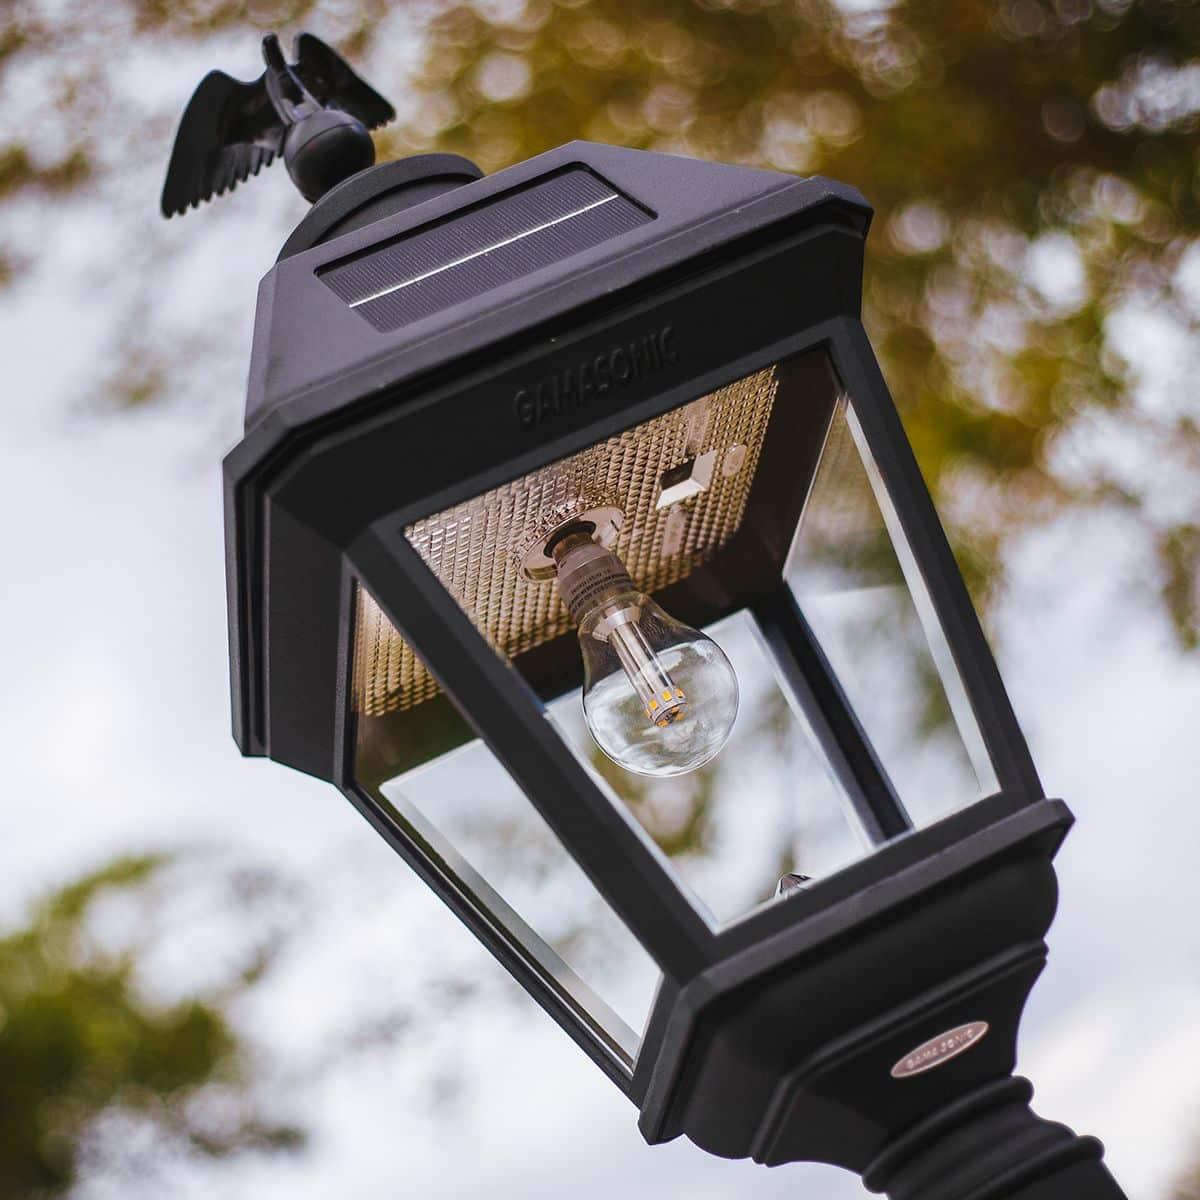 Gama Sonic Imperial Bulb Solar Post Light | Greenlytes Store